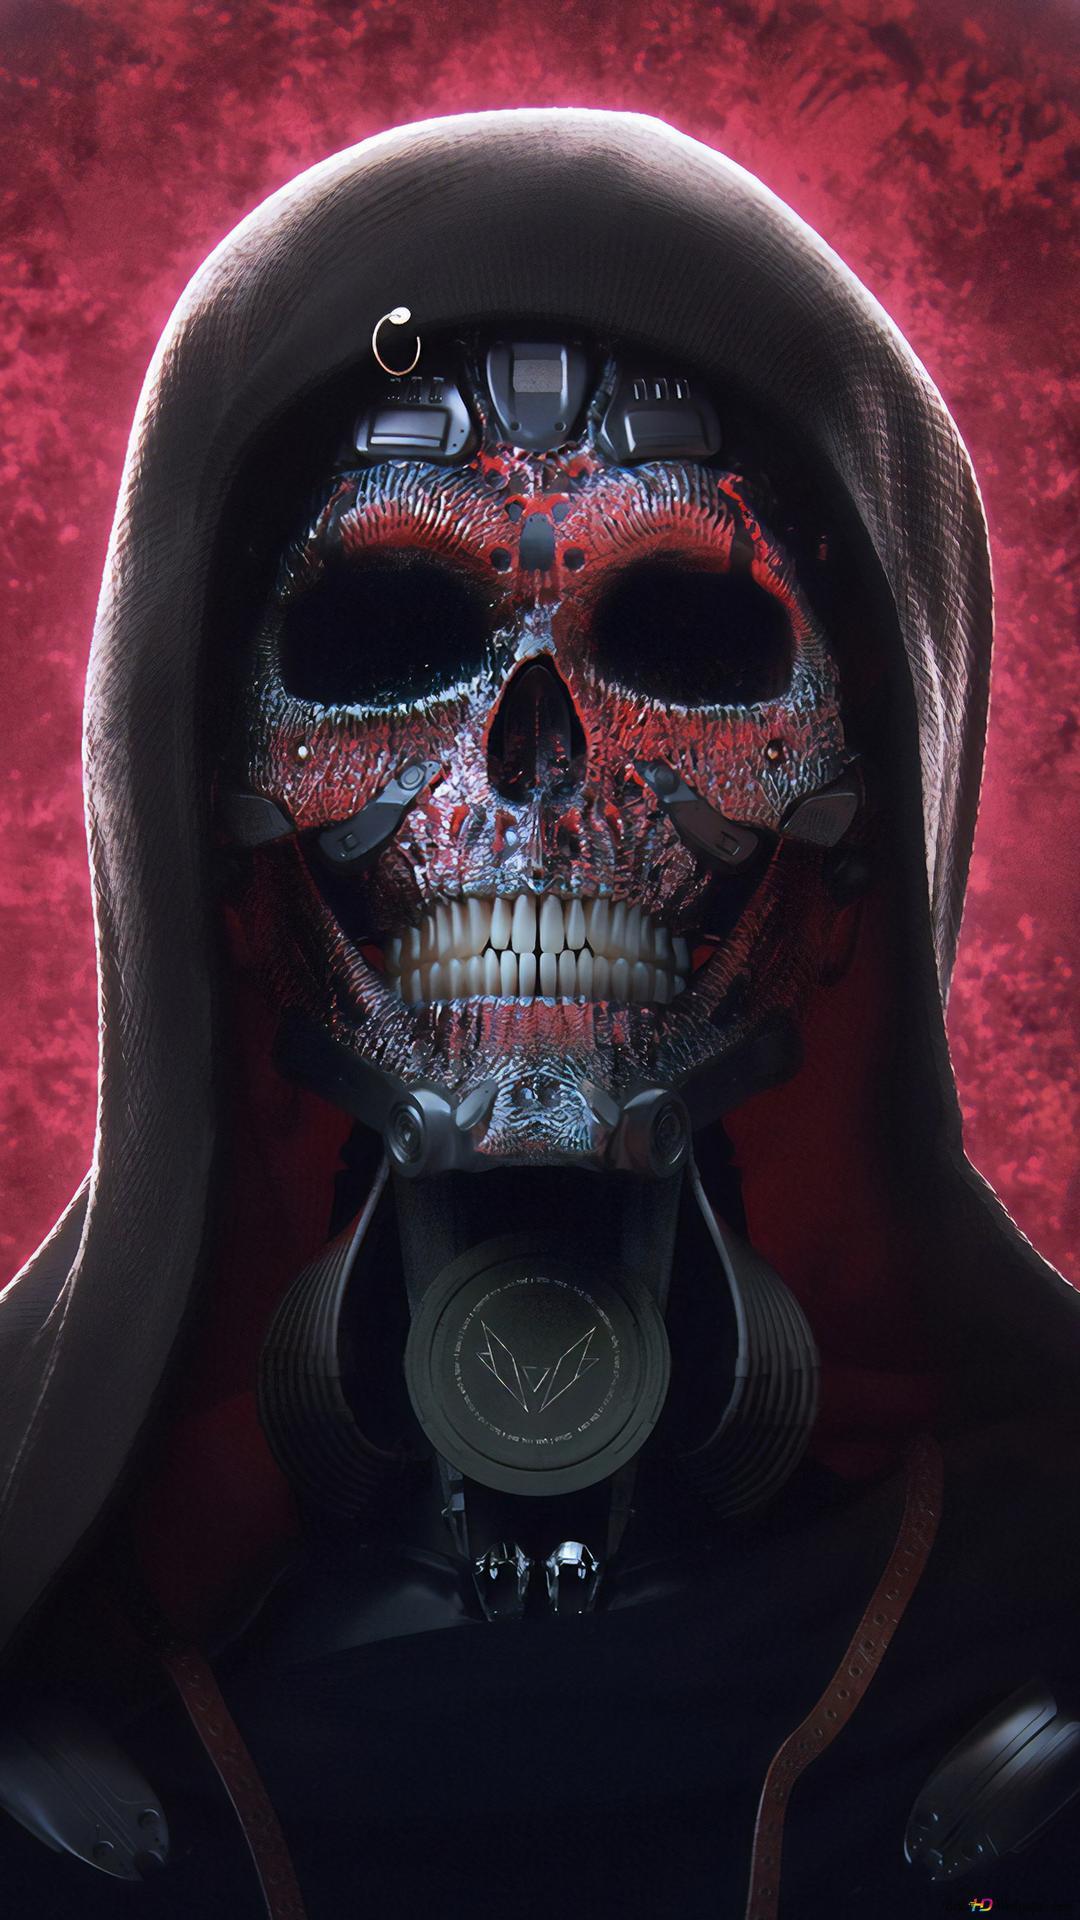 Cyborg Skull Hd Wallpaper Download